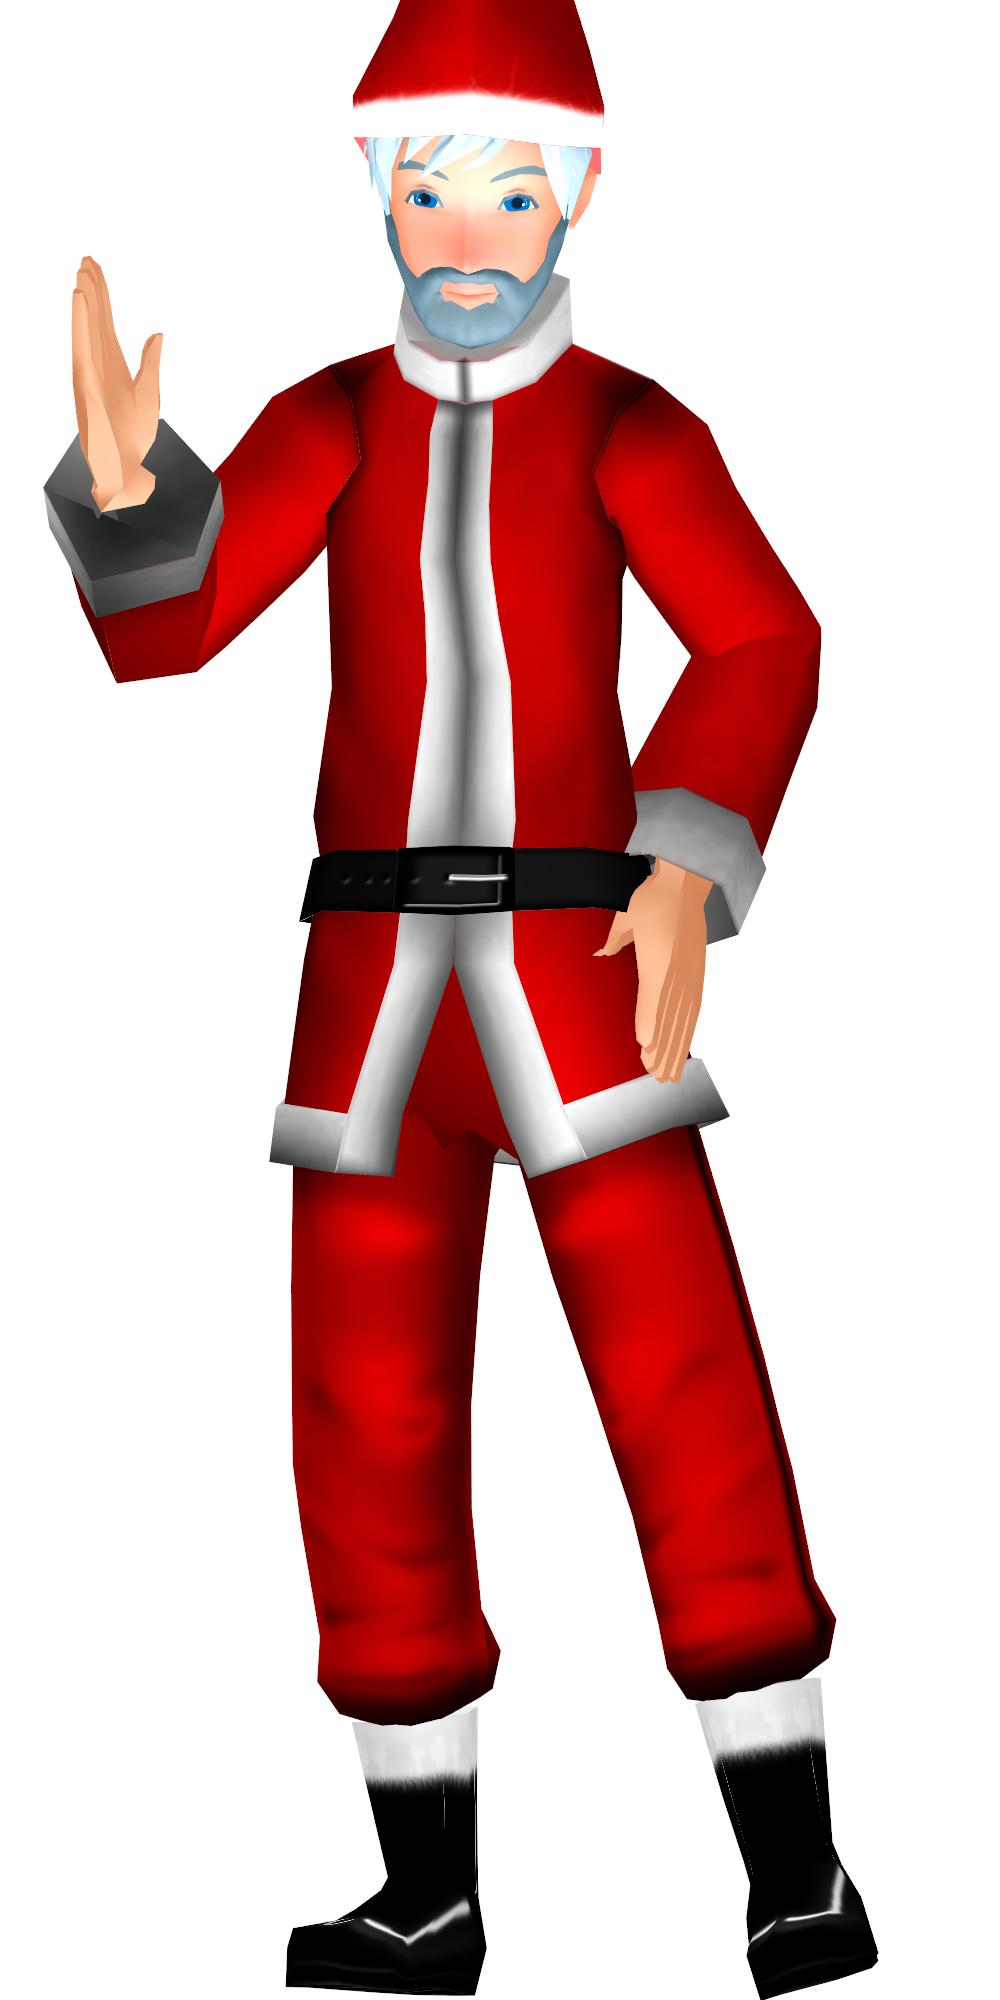 Santa Claus Cable Grace PD by nampukkk